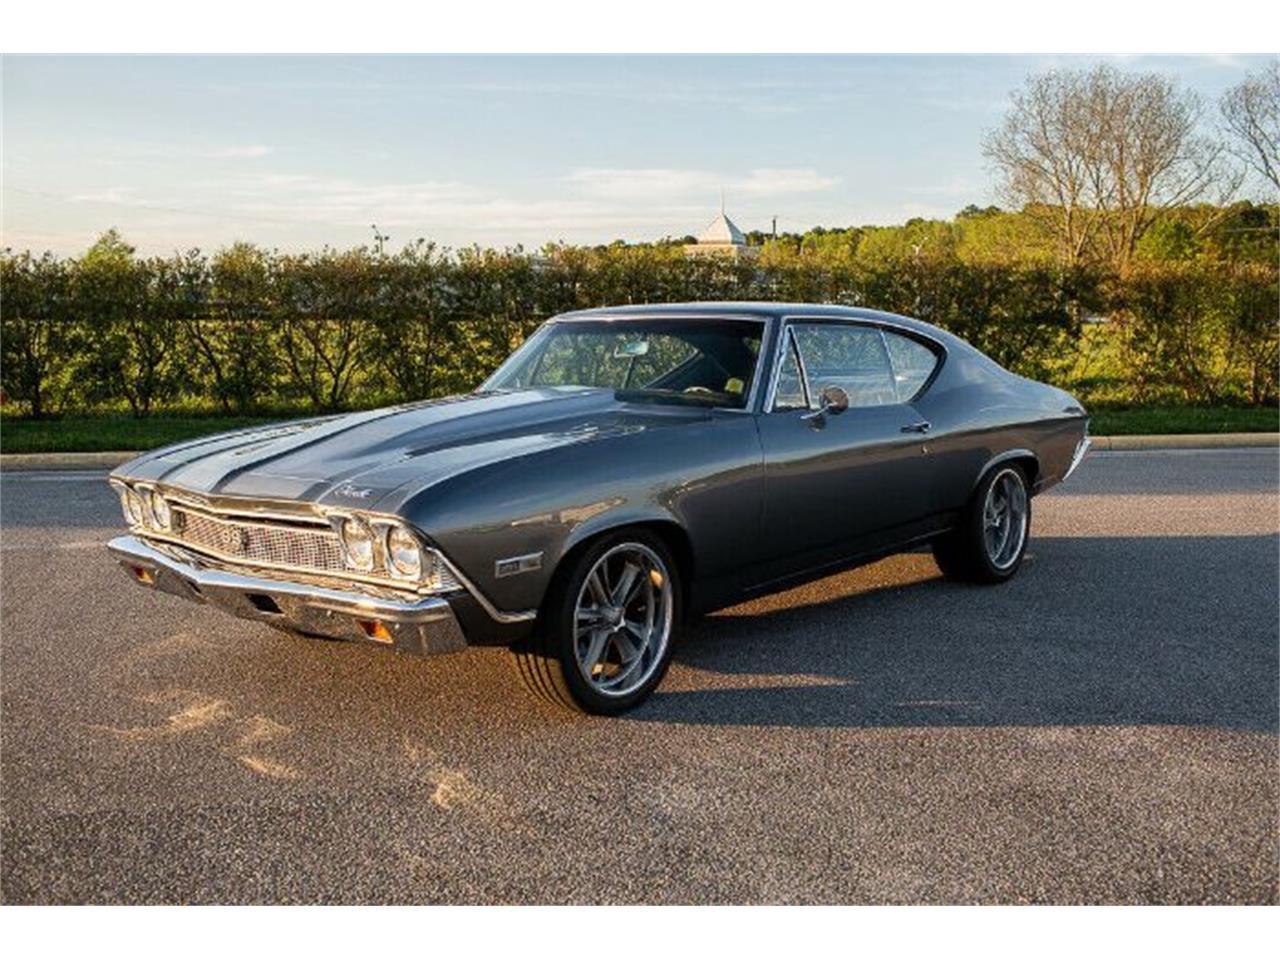 For Sale: 1968 Chevrolet Chevelle in Cadillac, Michigan